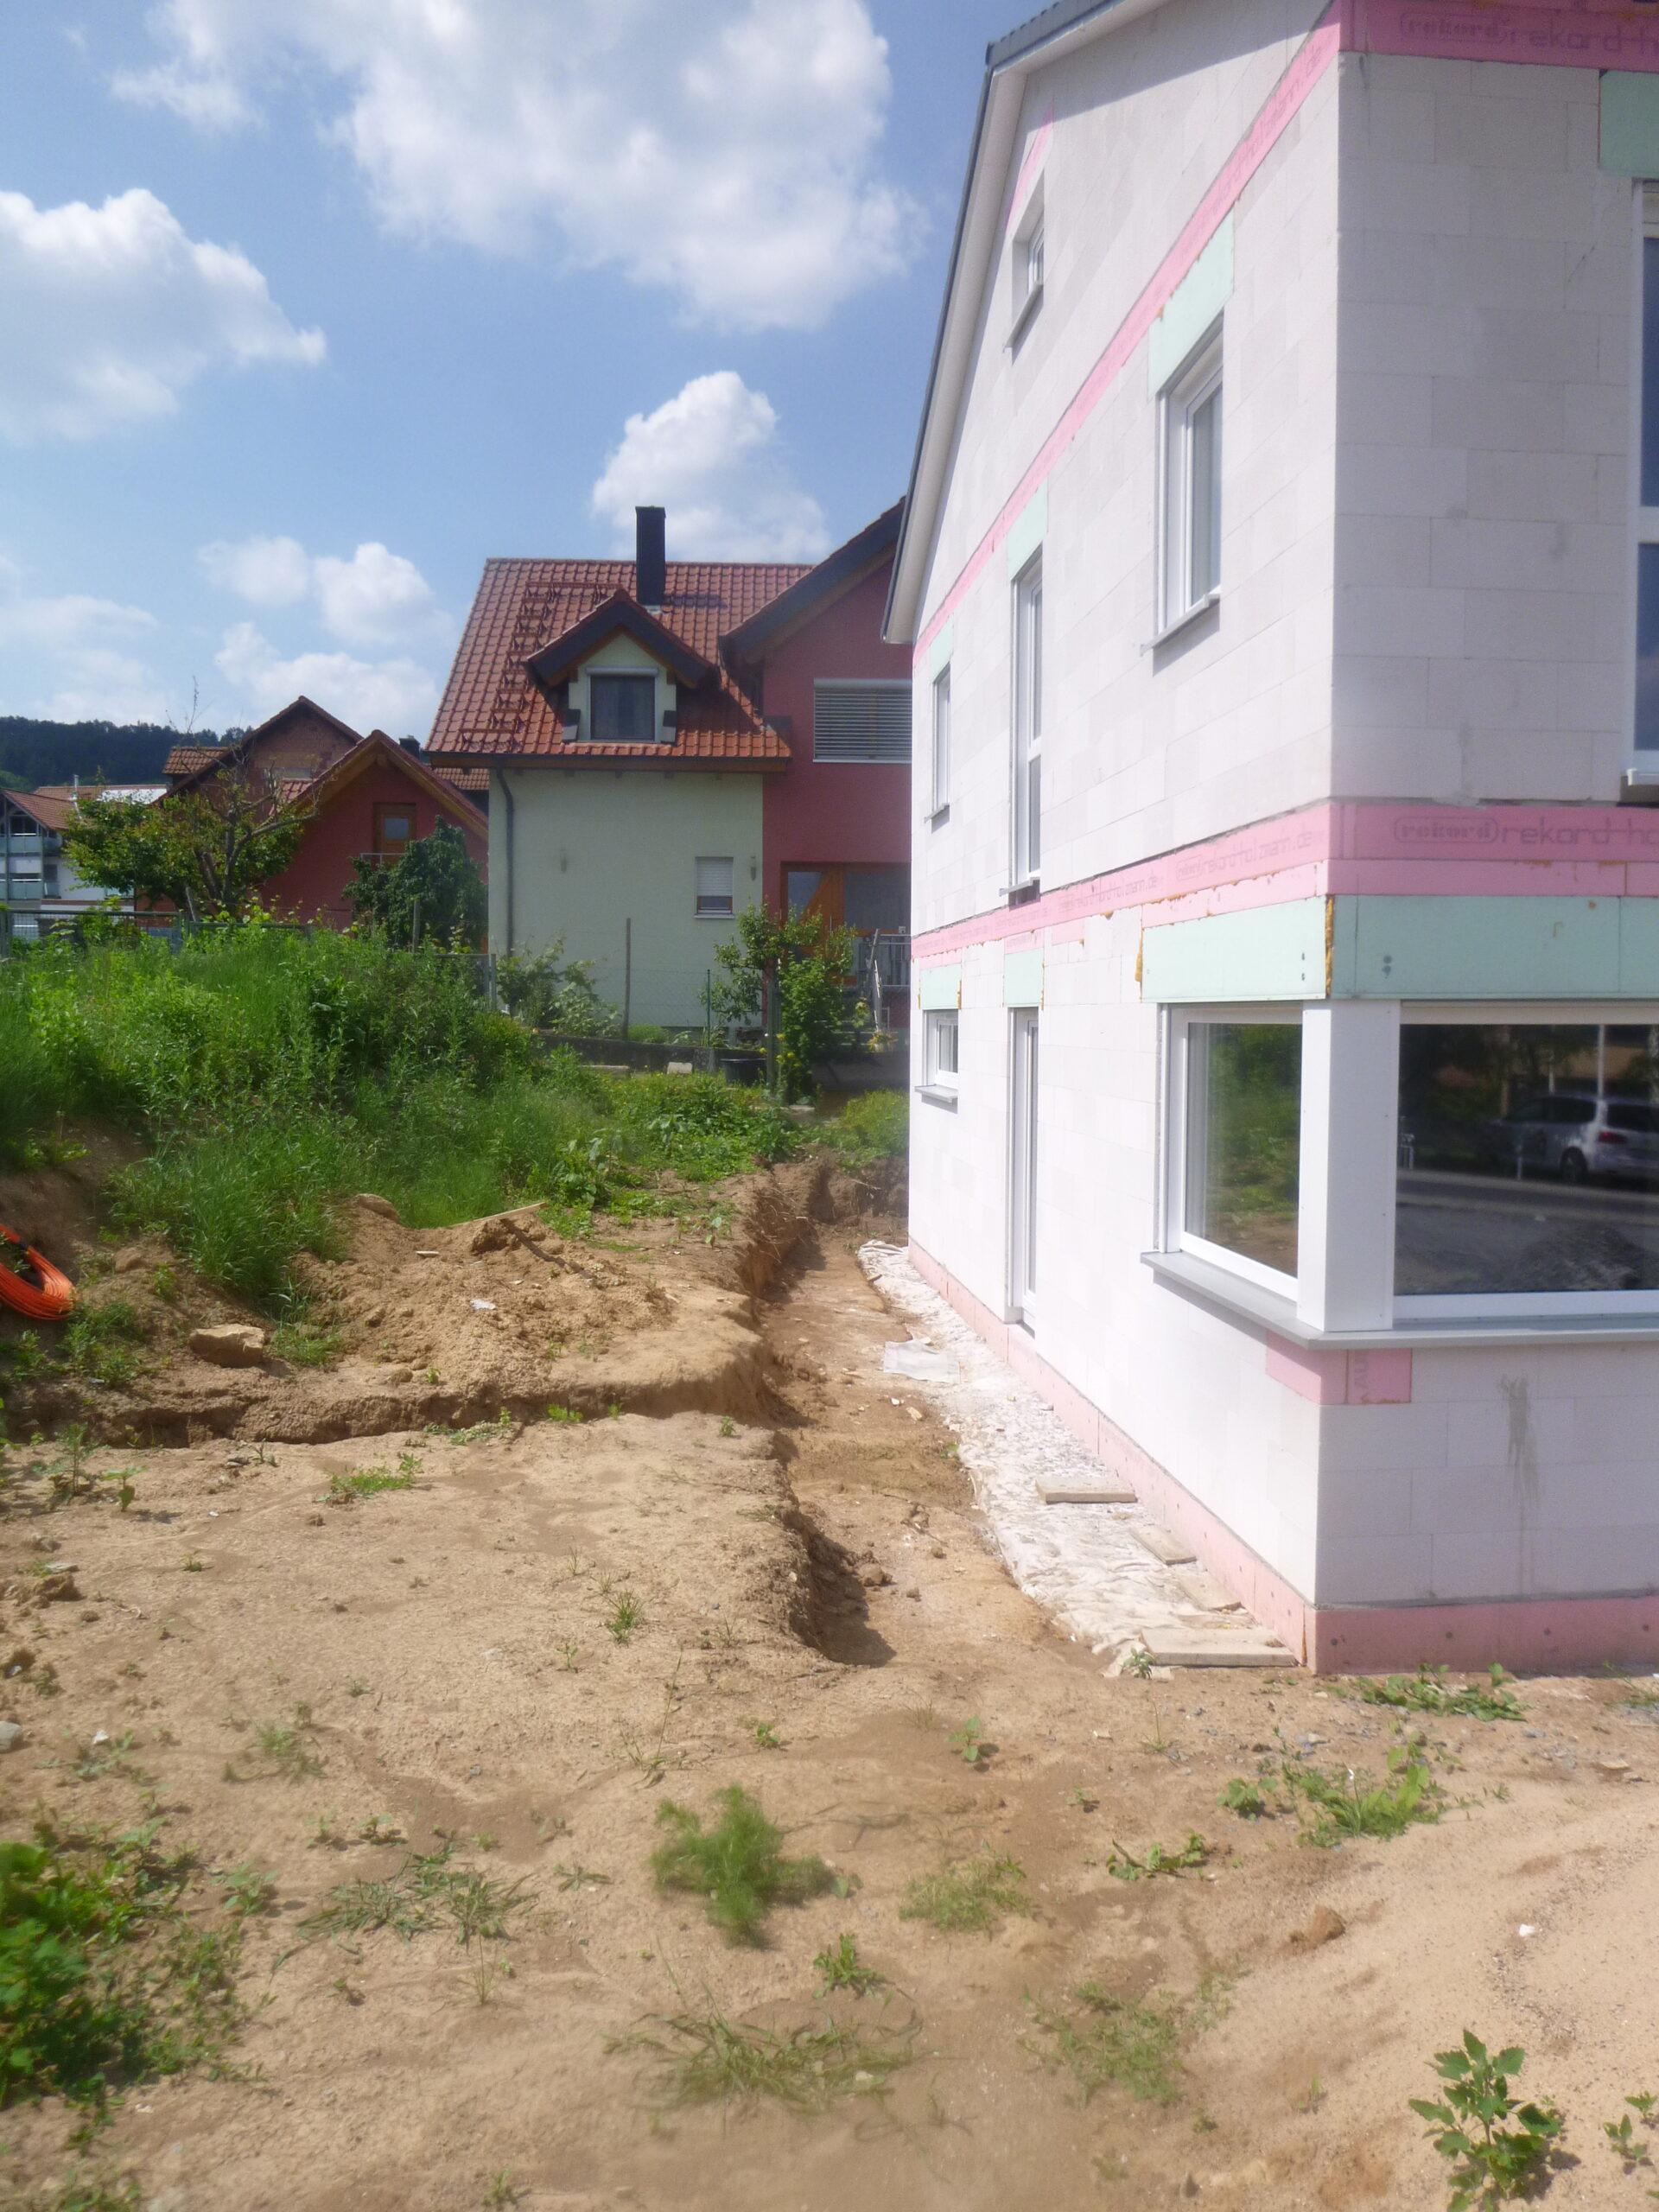 Rohbau - Graf-Rieneck-Strasse 20 - Erlabrunn (5)